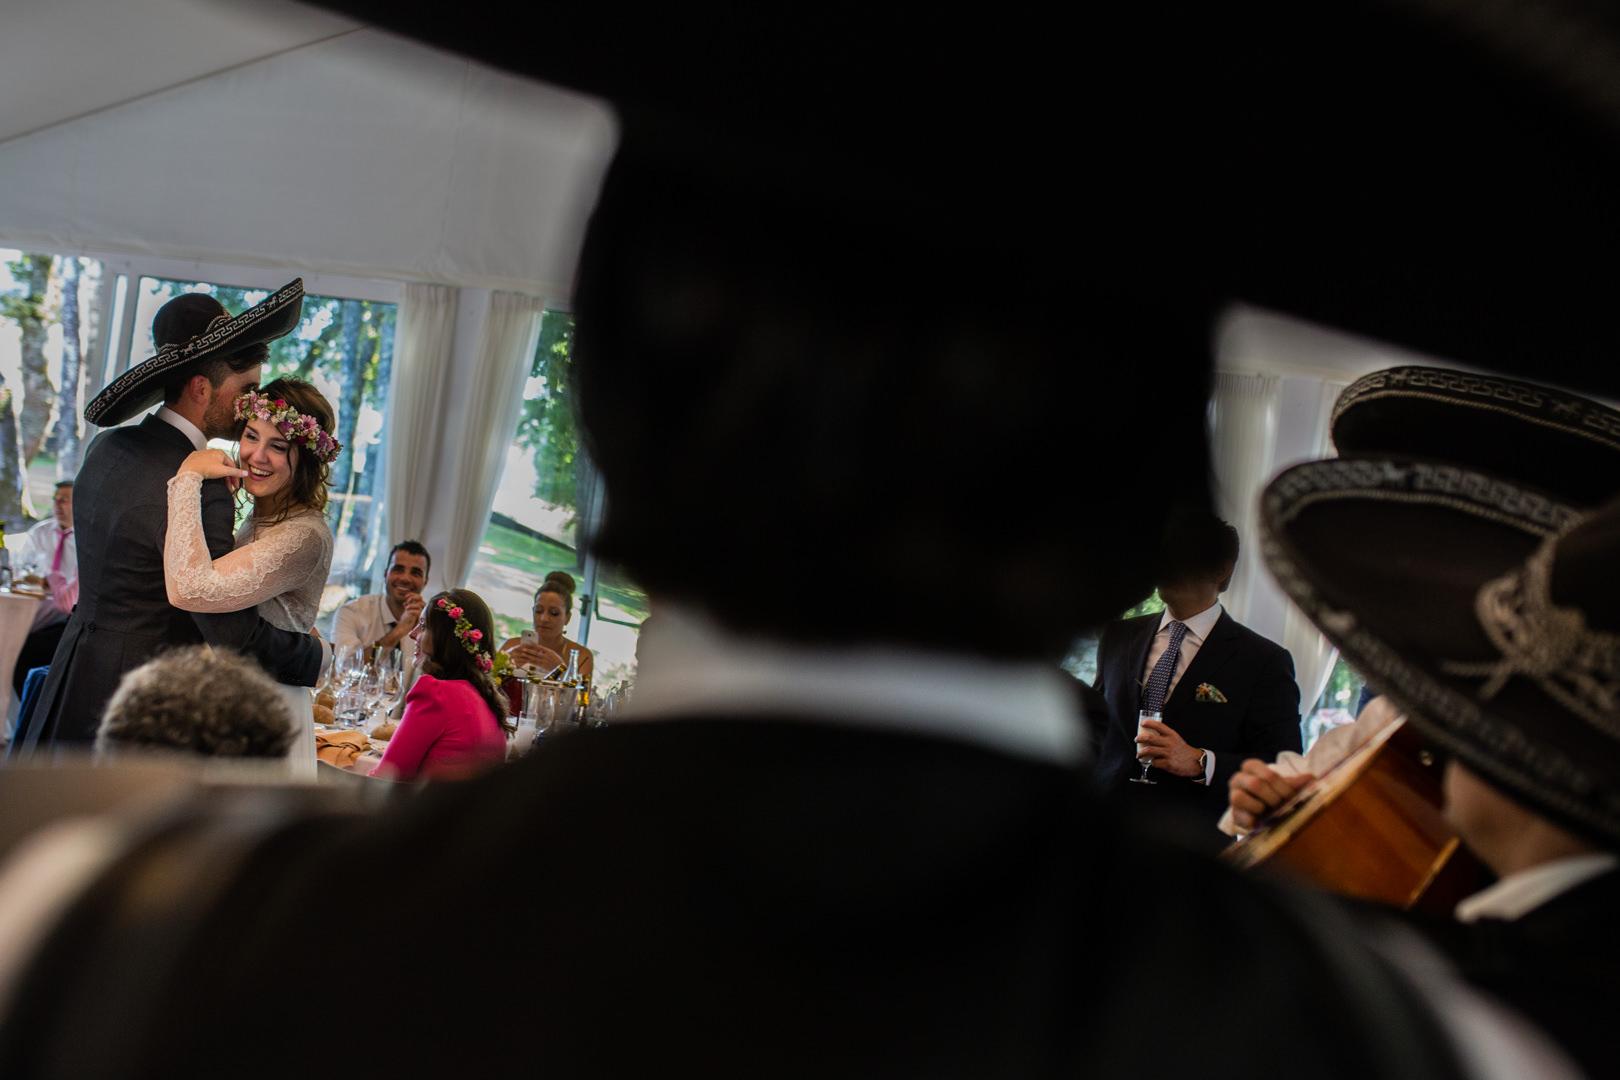 Boda-Lucia-Javi-Lugo-Rafael-Torres-fotografo-bodas-sevilla-madrid-barcelona-wedding-photographer--37.jpg